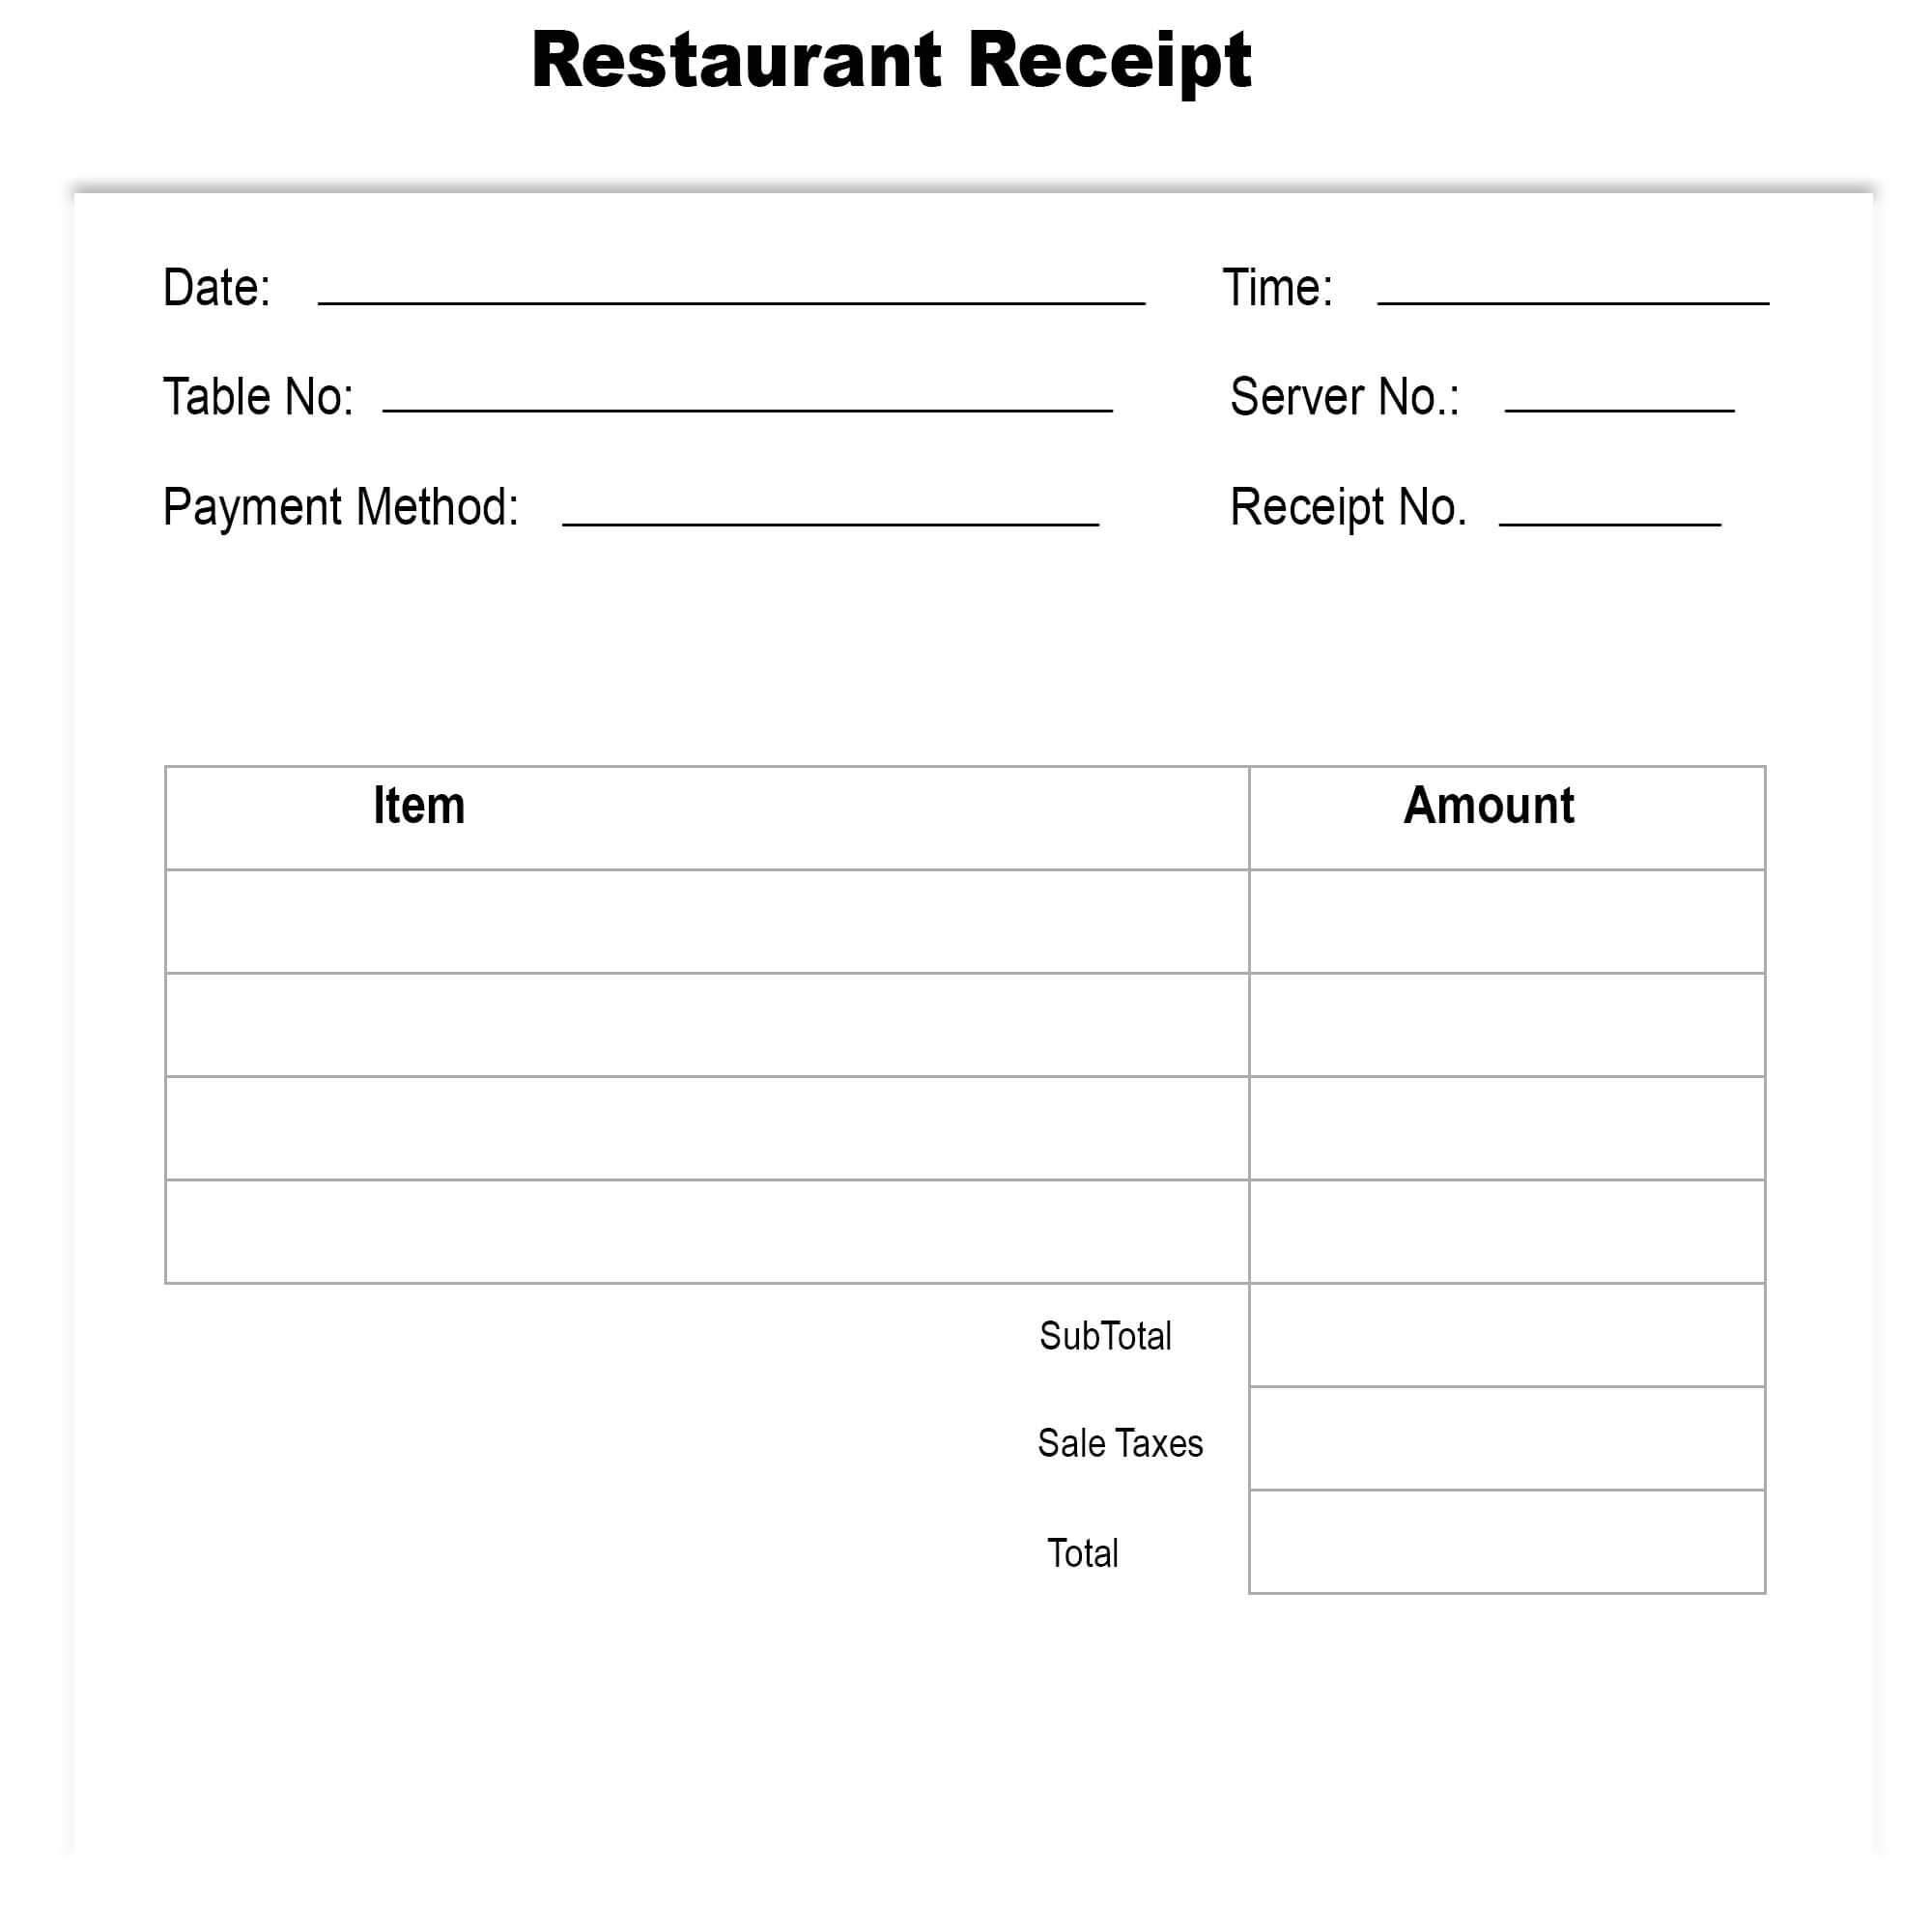 Restaurant Receipt Template Excel   The Receipt Template For Blank Taxi Receipt Template